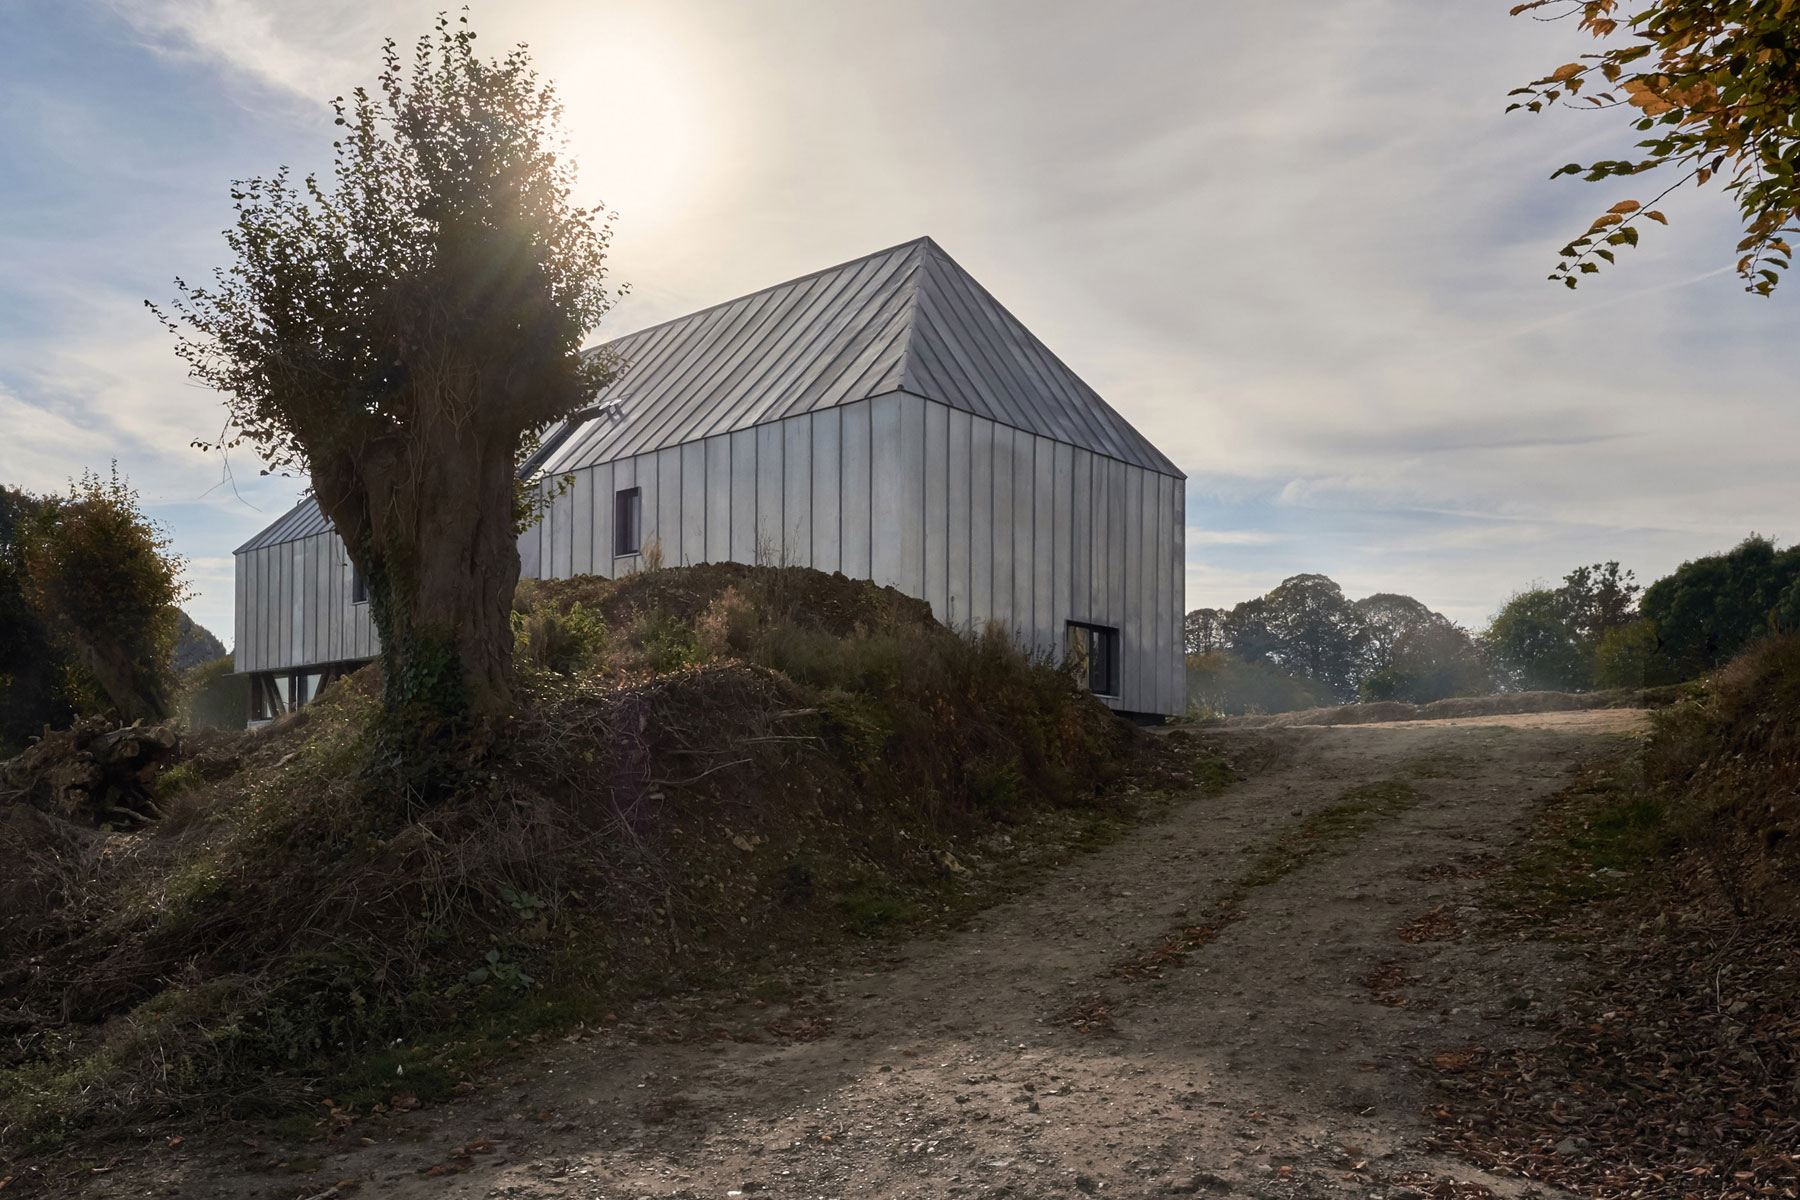 Antonin-Ziegler-covers-abandoned-barn-in-zinc-plates-02